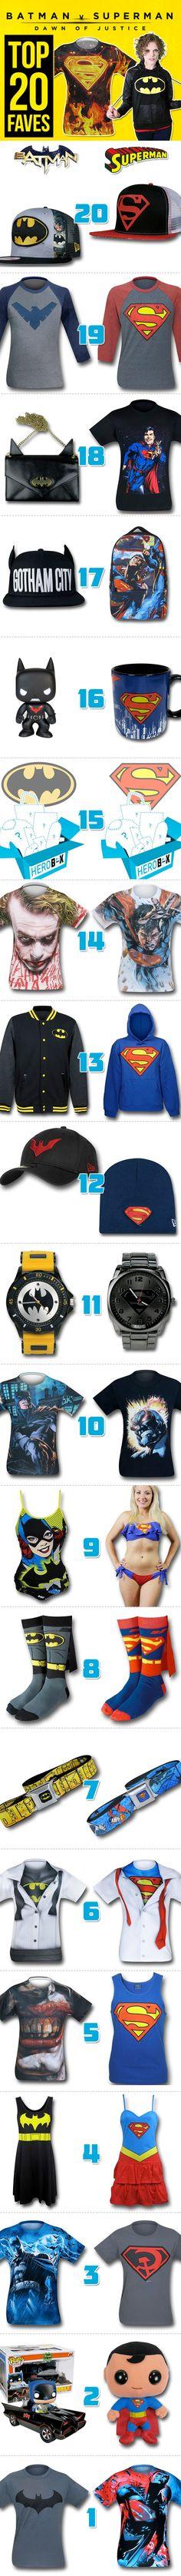 Batman Vs. Superman which will you choose?